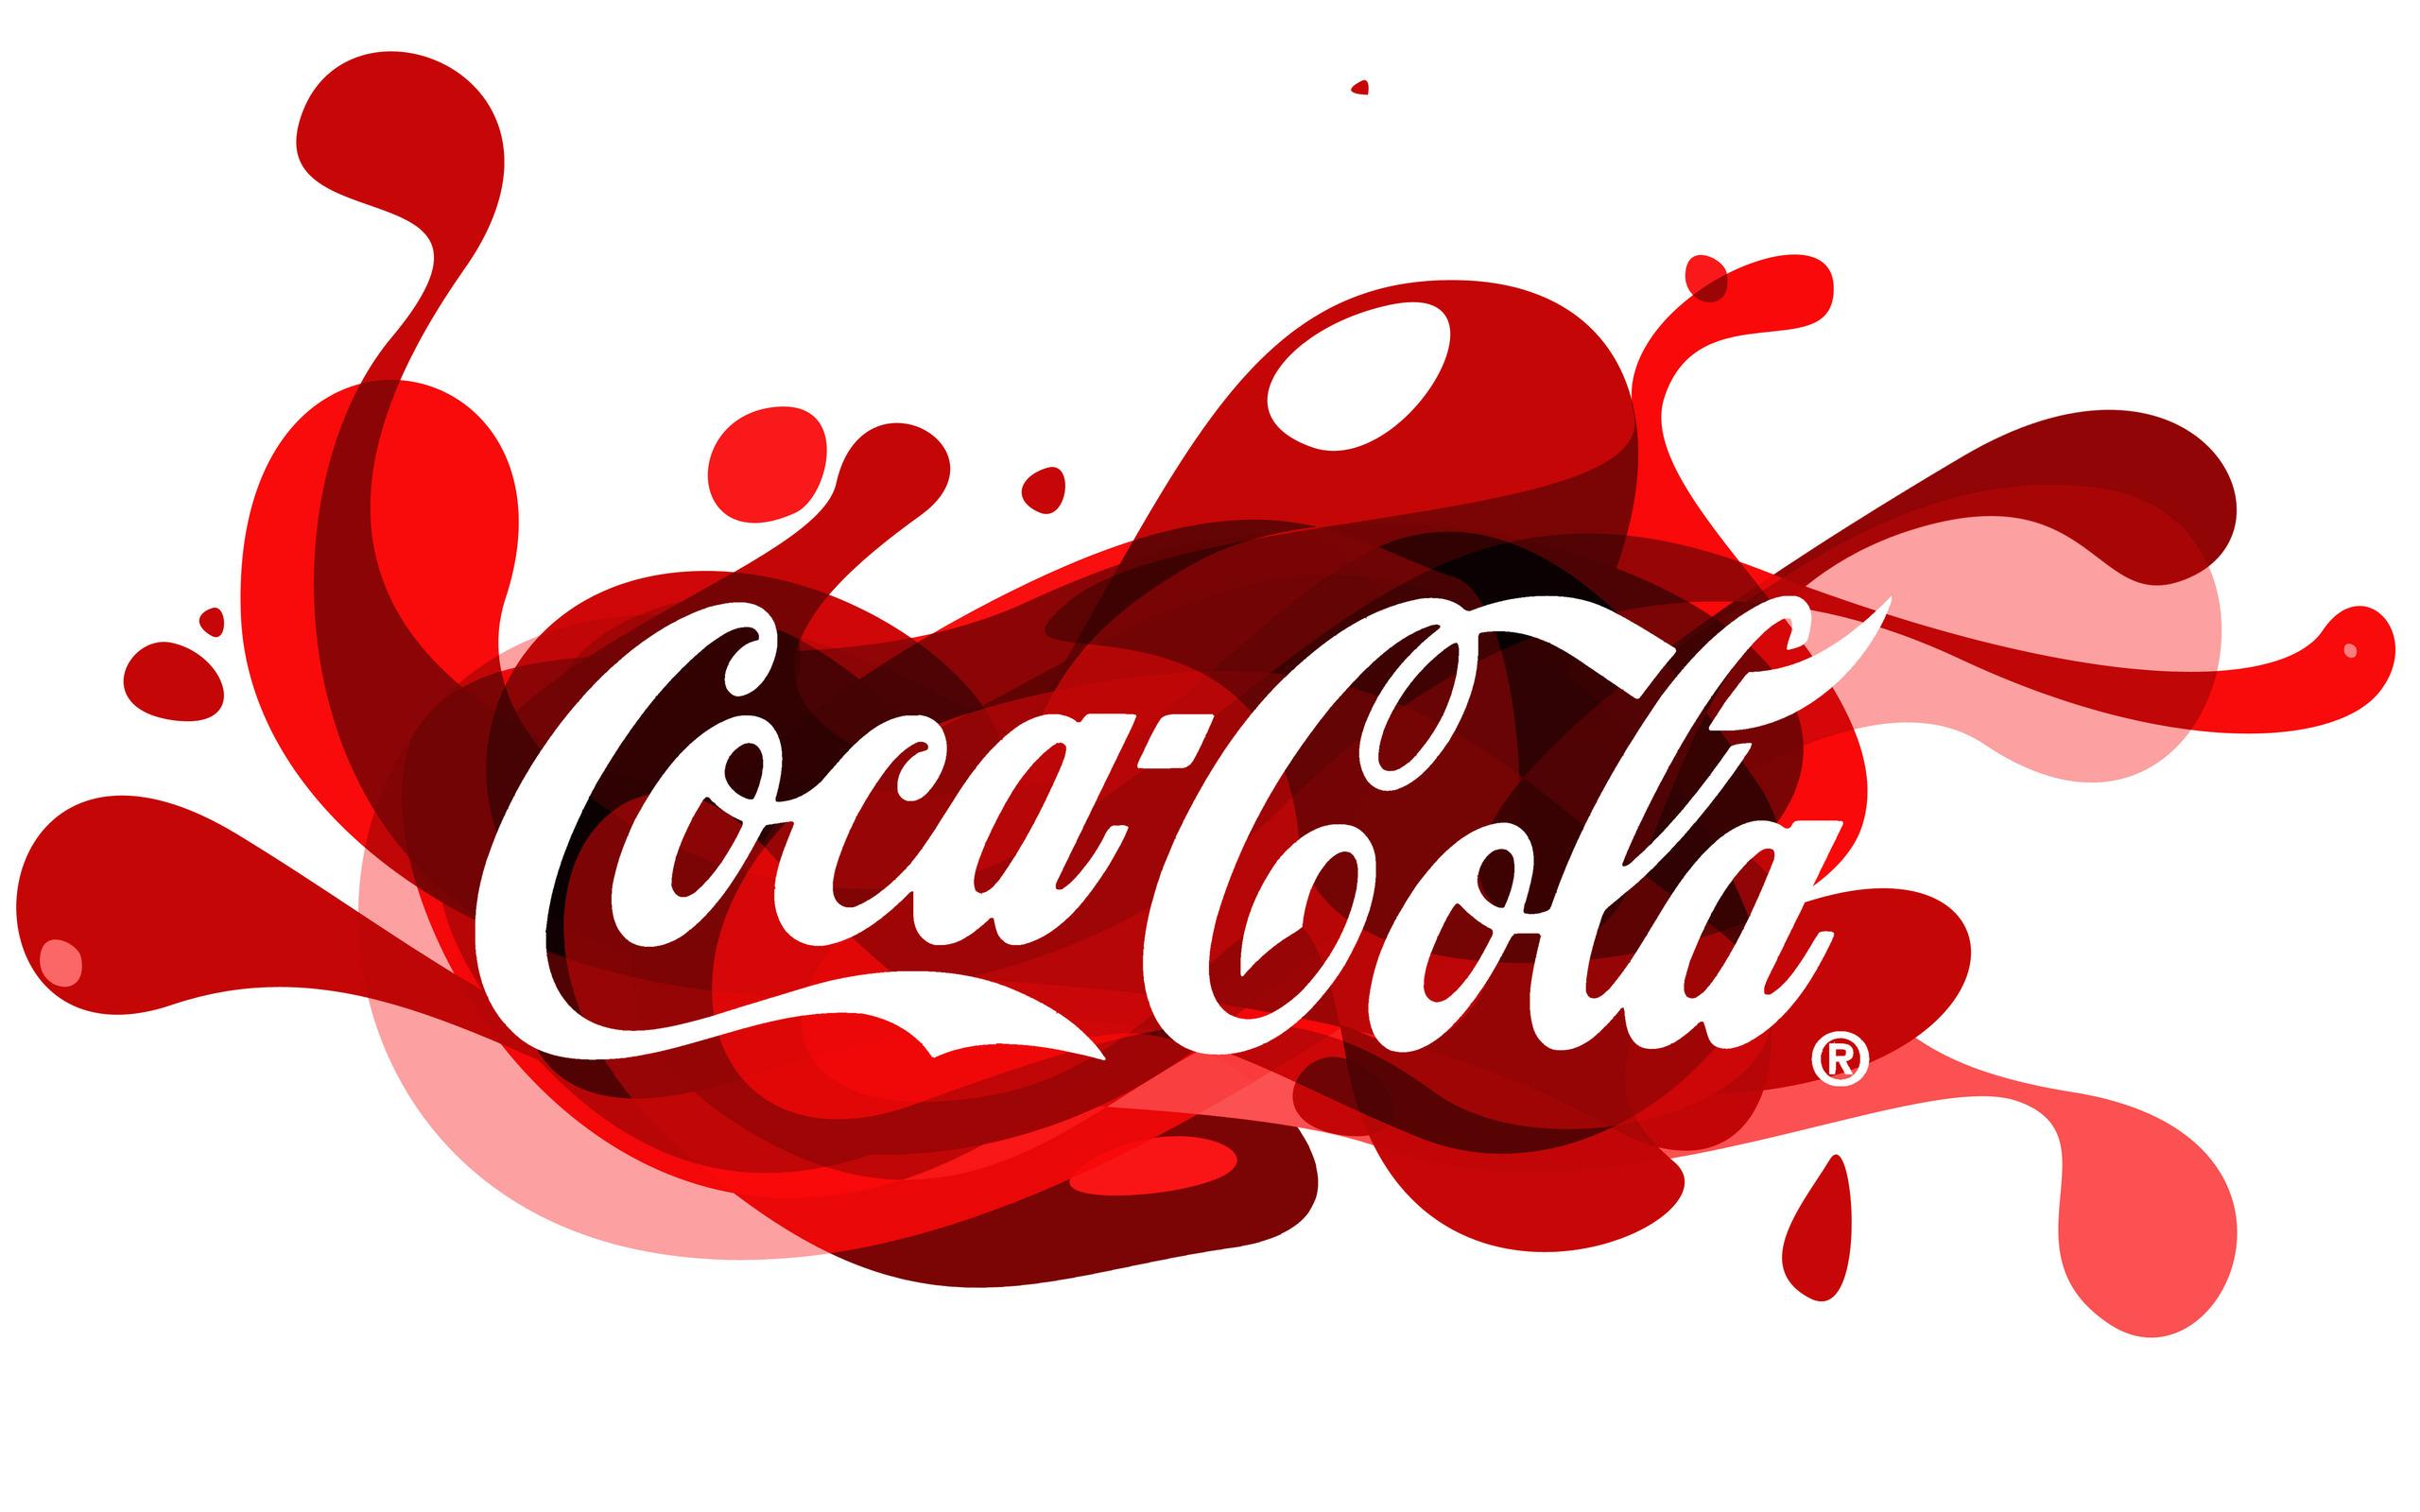 http://www.zastavki.com/pictures/2560x1600/2011/Brands_Logo_Coca-Colla_030337_.jpg